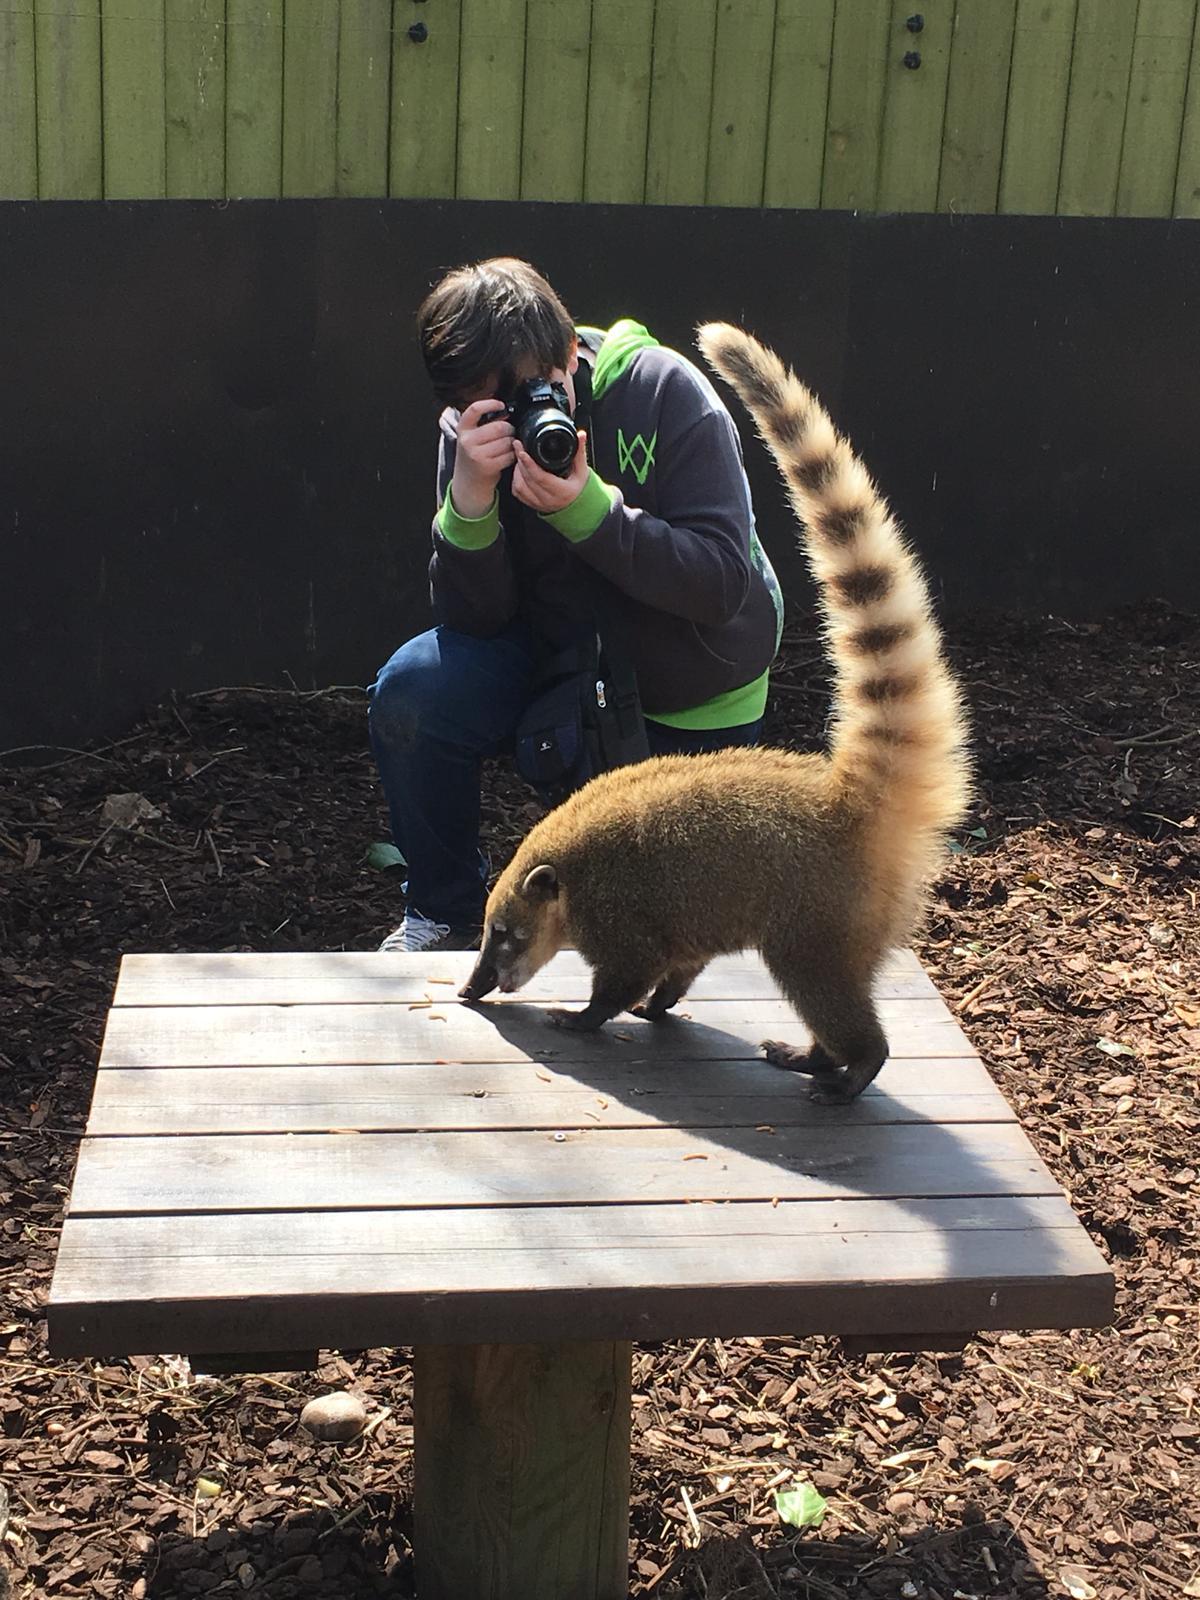 Child photography day 2019.jpg